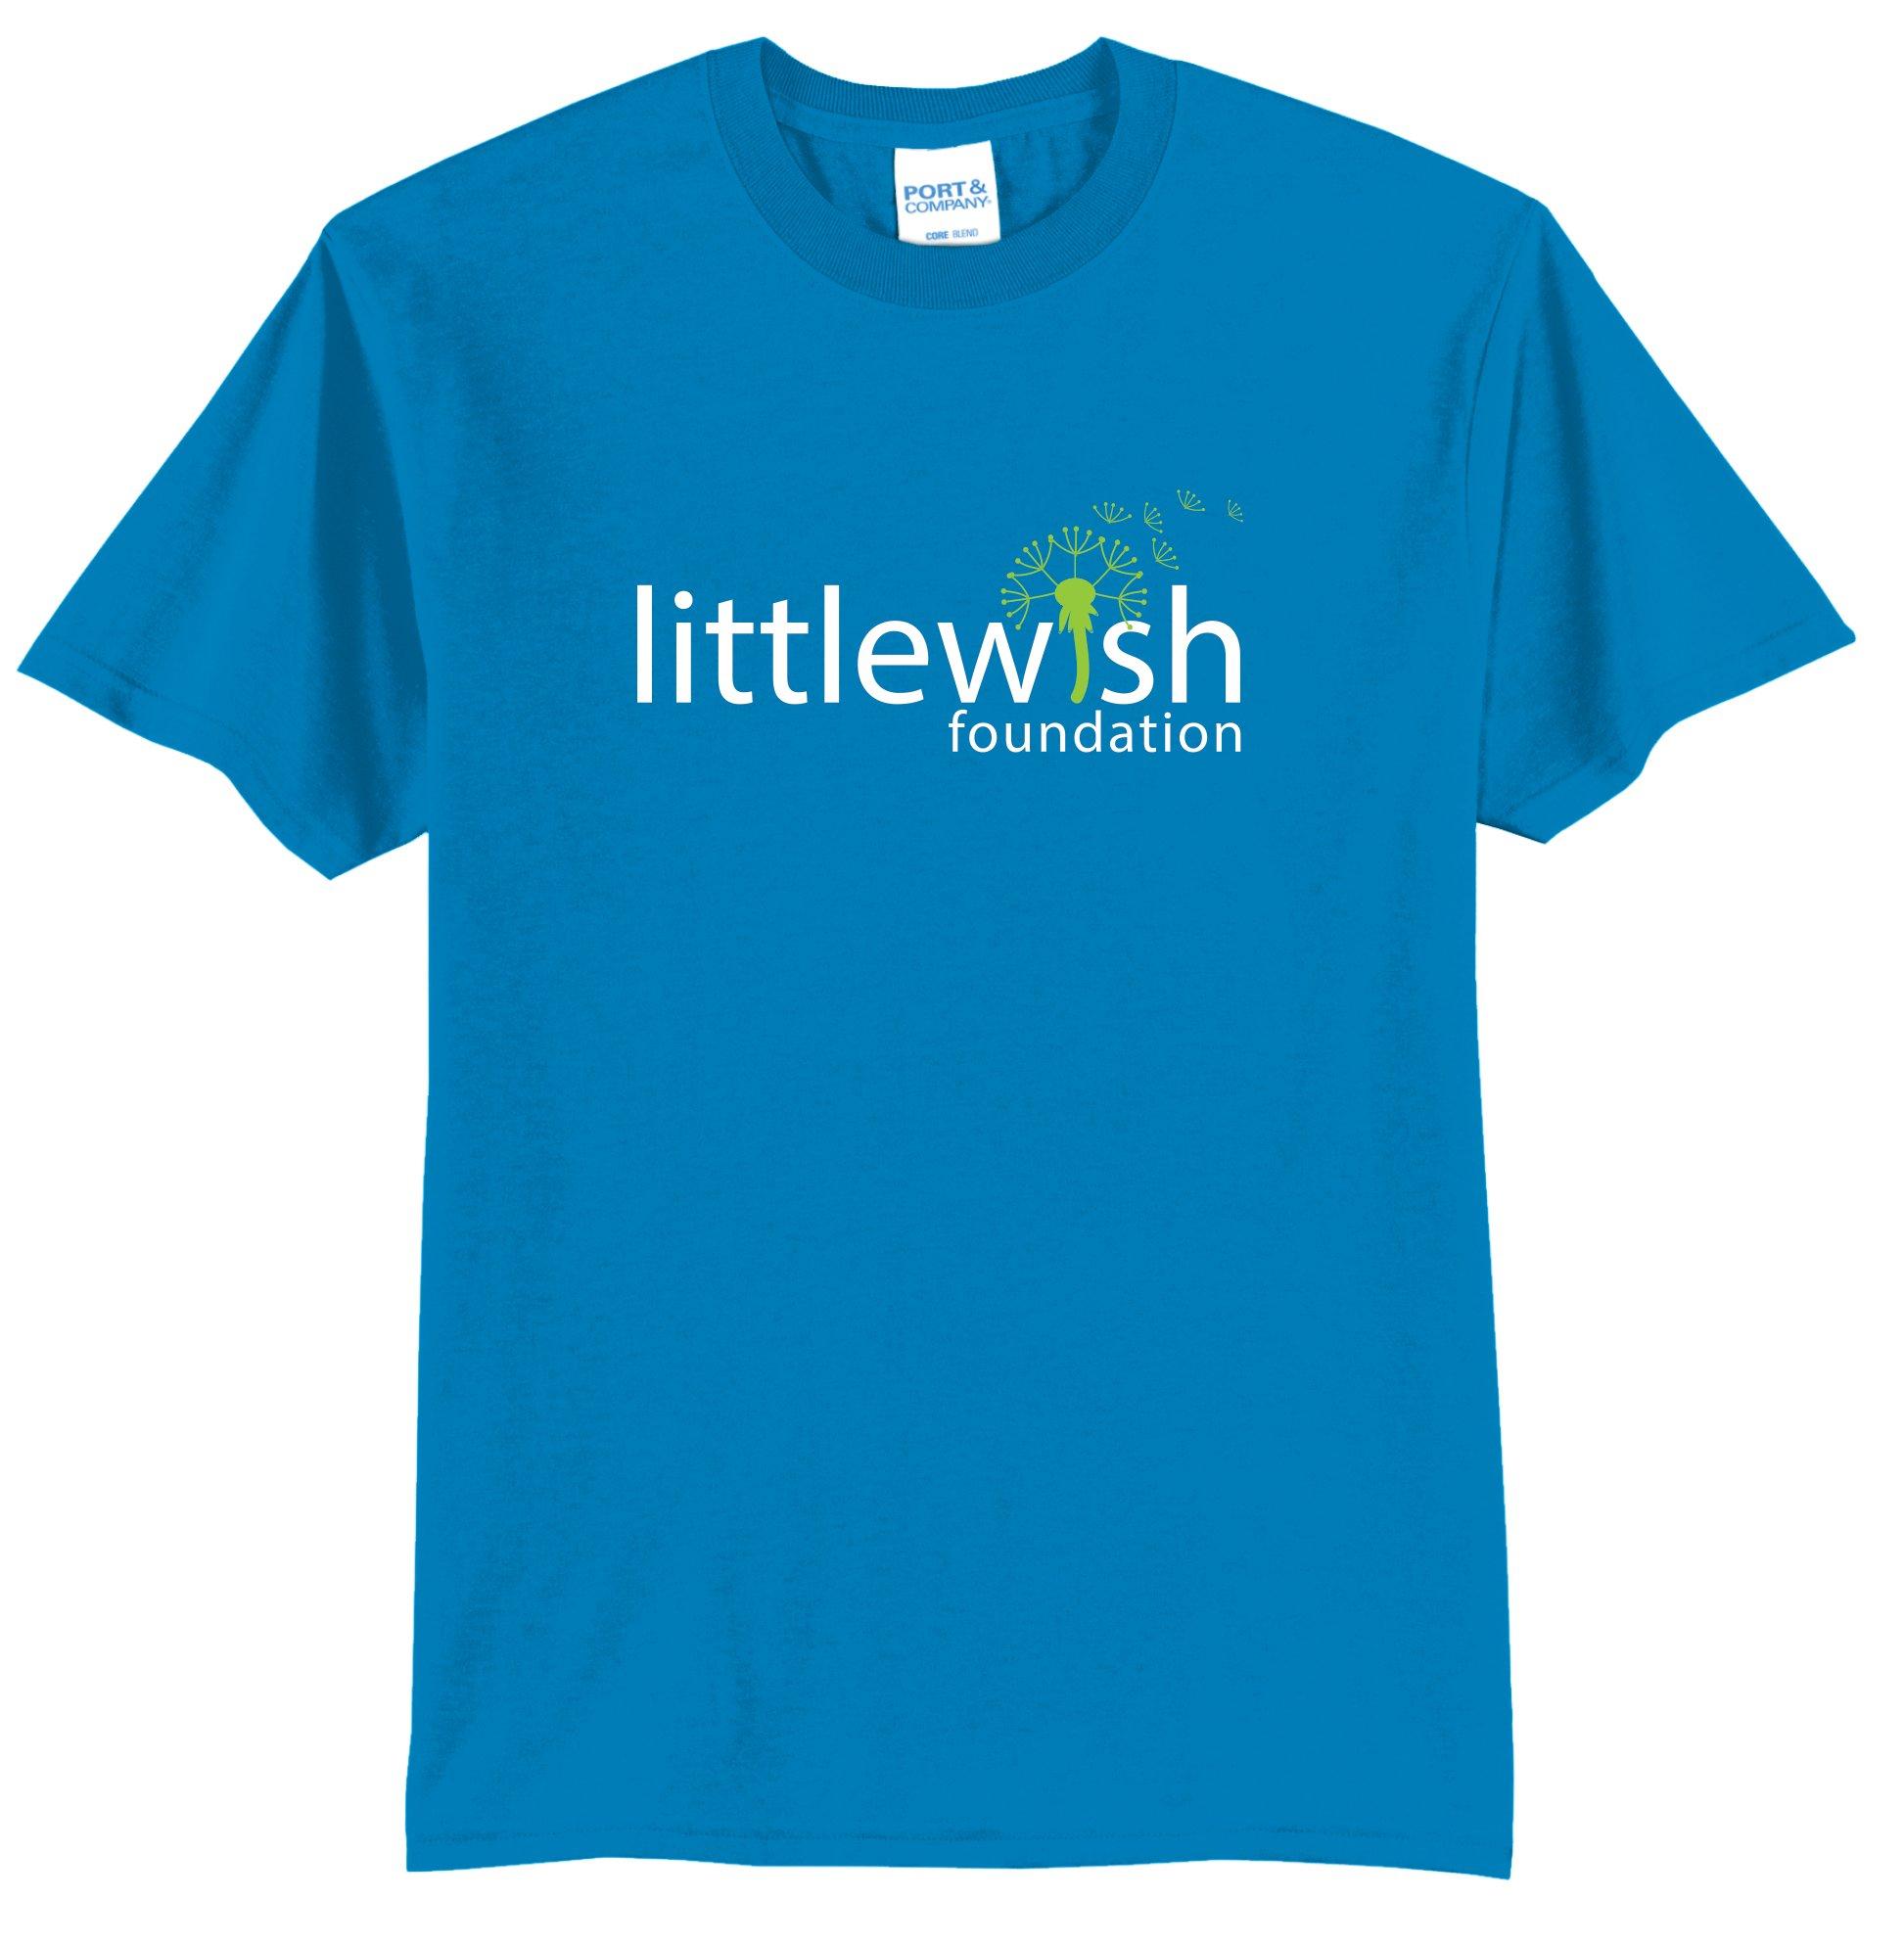 Little Wish Foundation Child T-shirt 00002